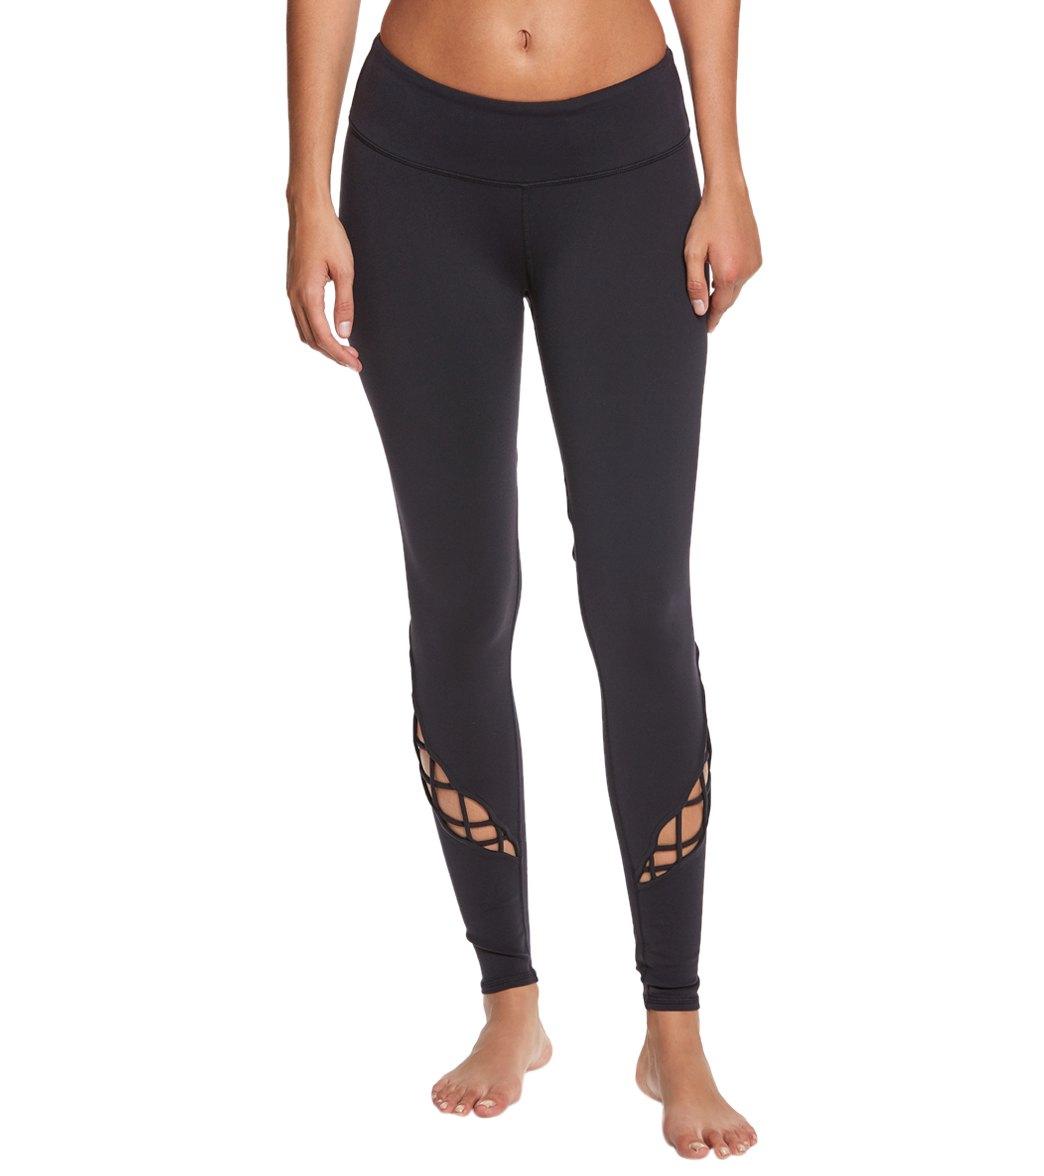 441417624e5a4 Alo Yoga Entwine Yoga Leggings at YogaOutlet.com - Free Shipping